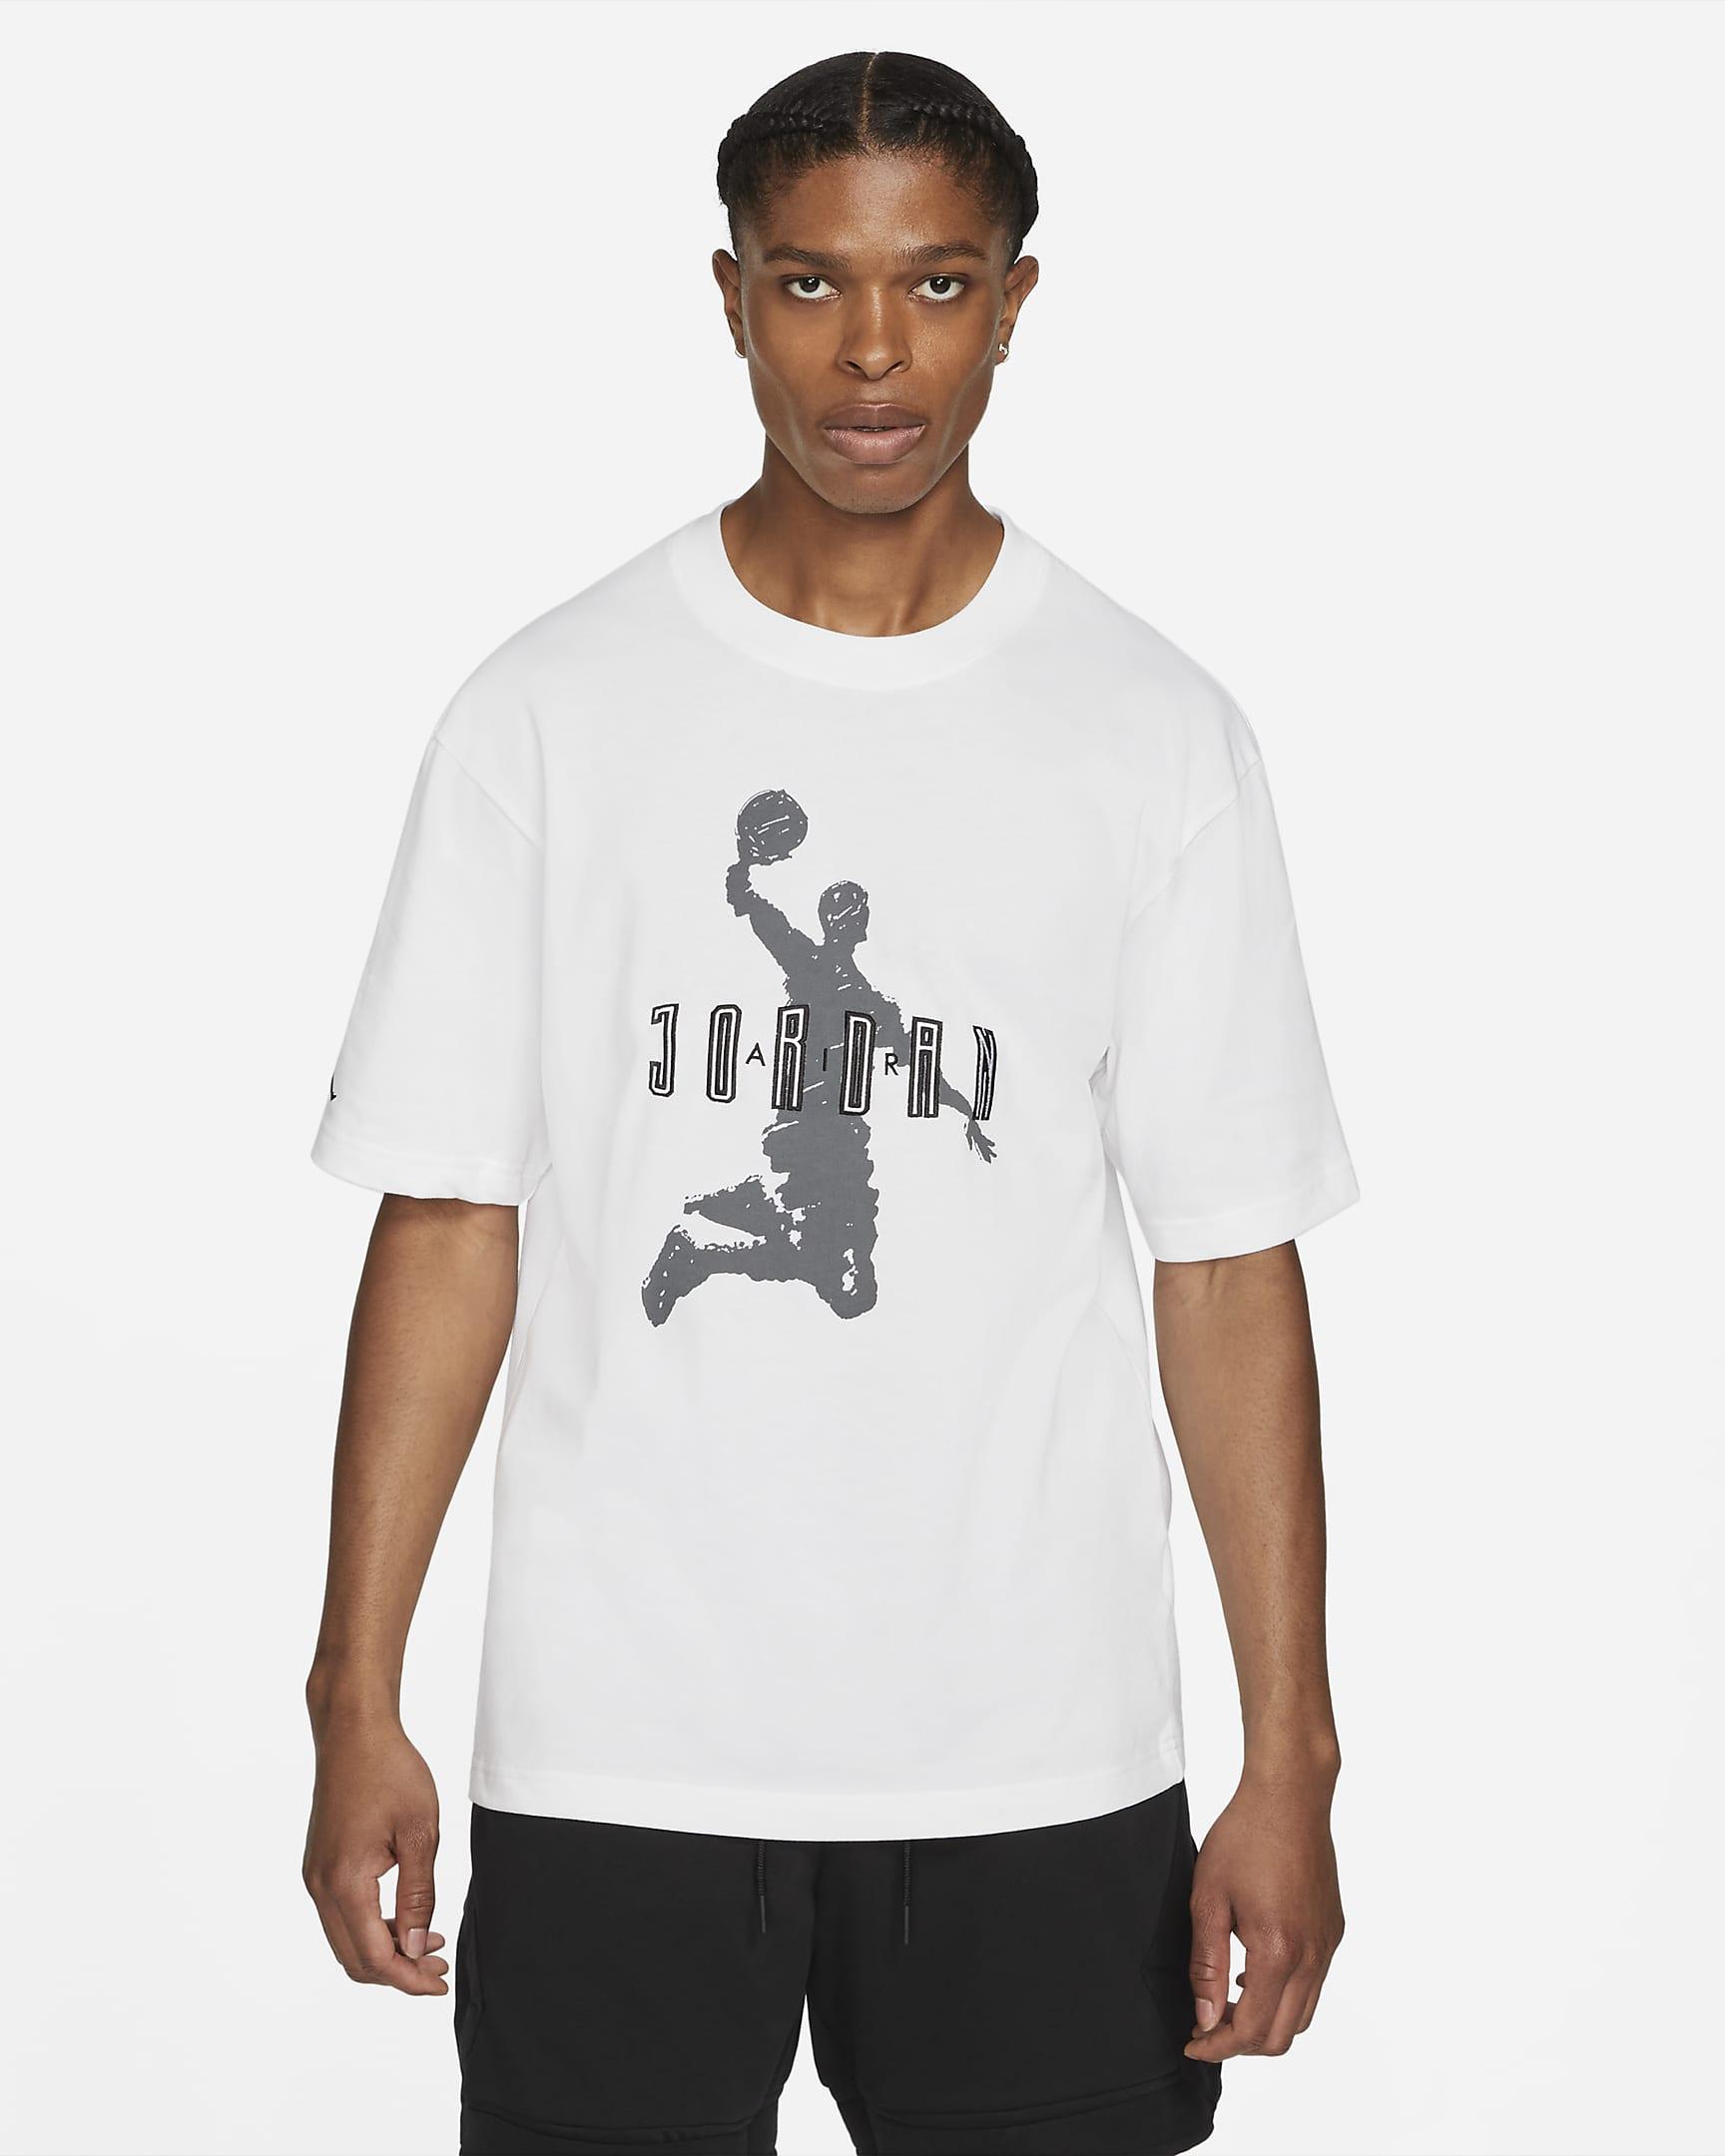 jordan-sport-dna-85-mens-short-sleeve-t-shirt-WS686C.png